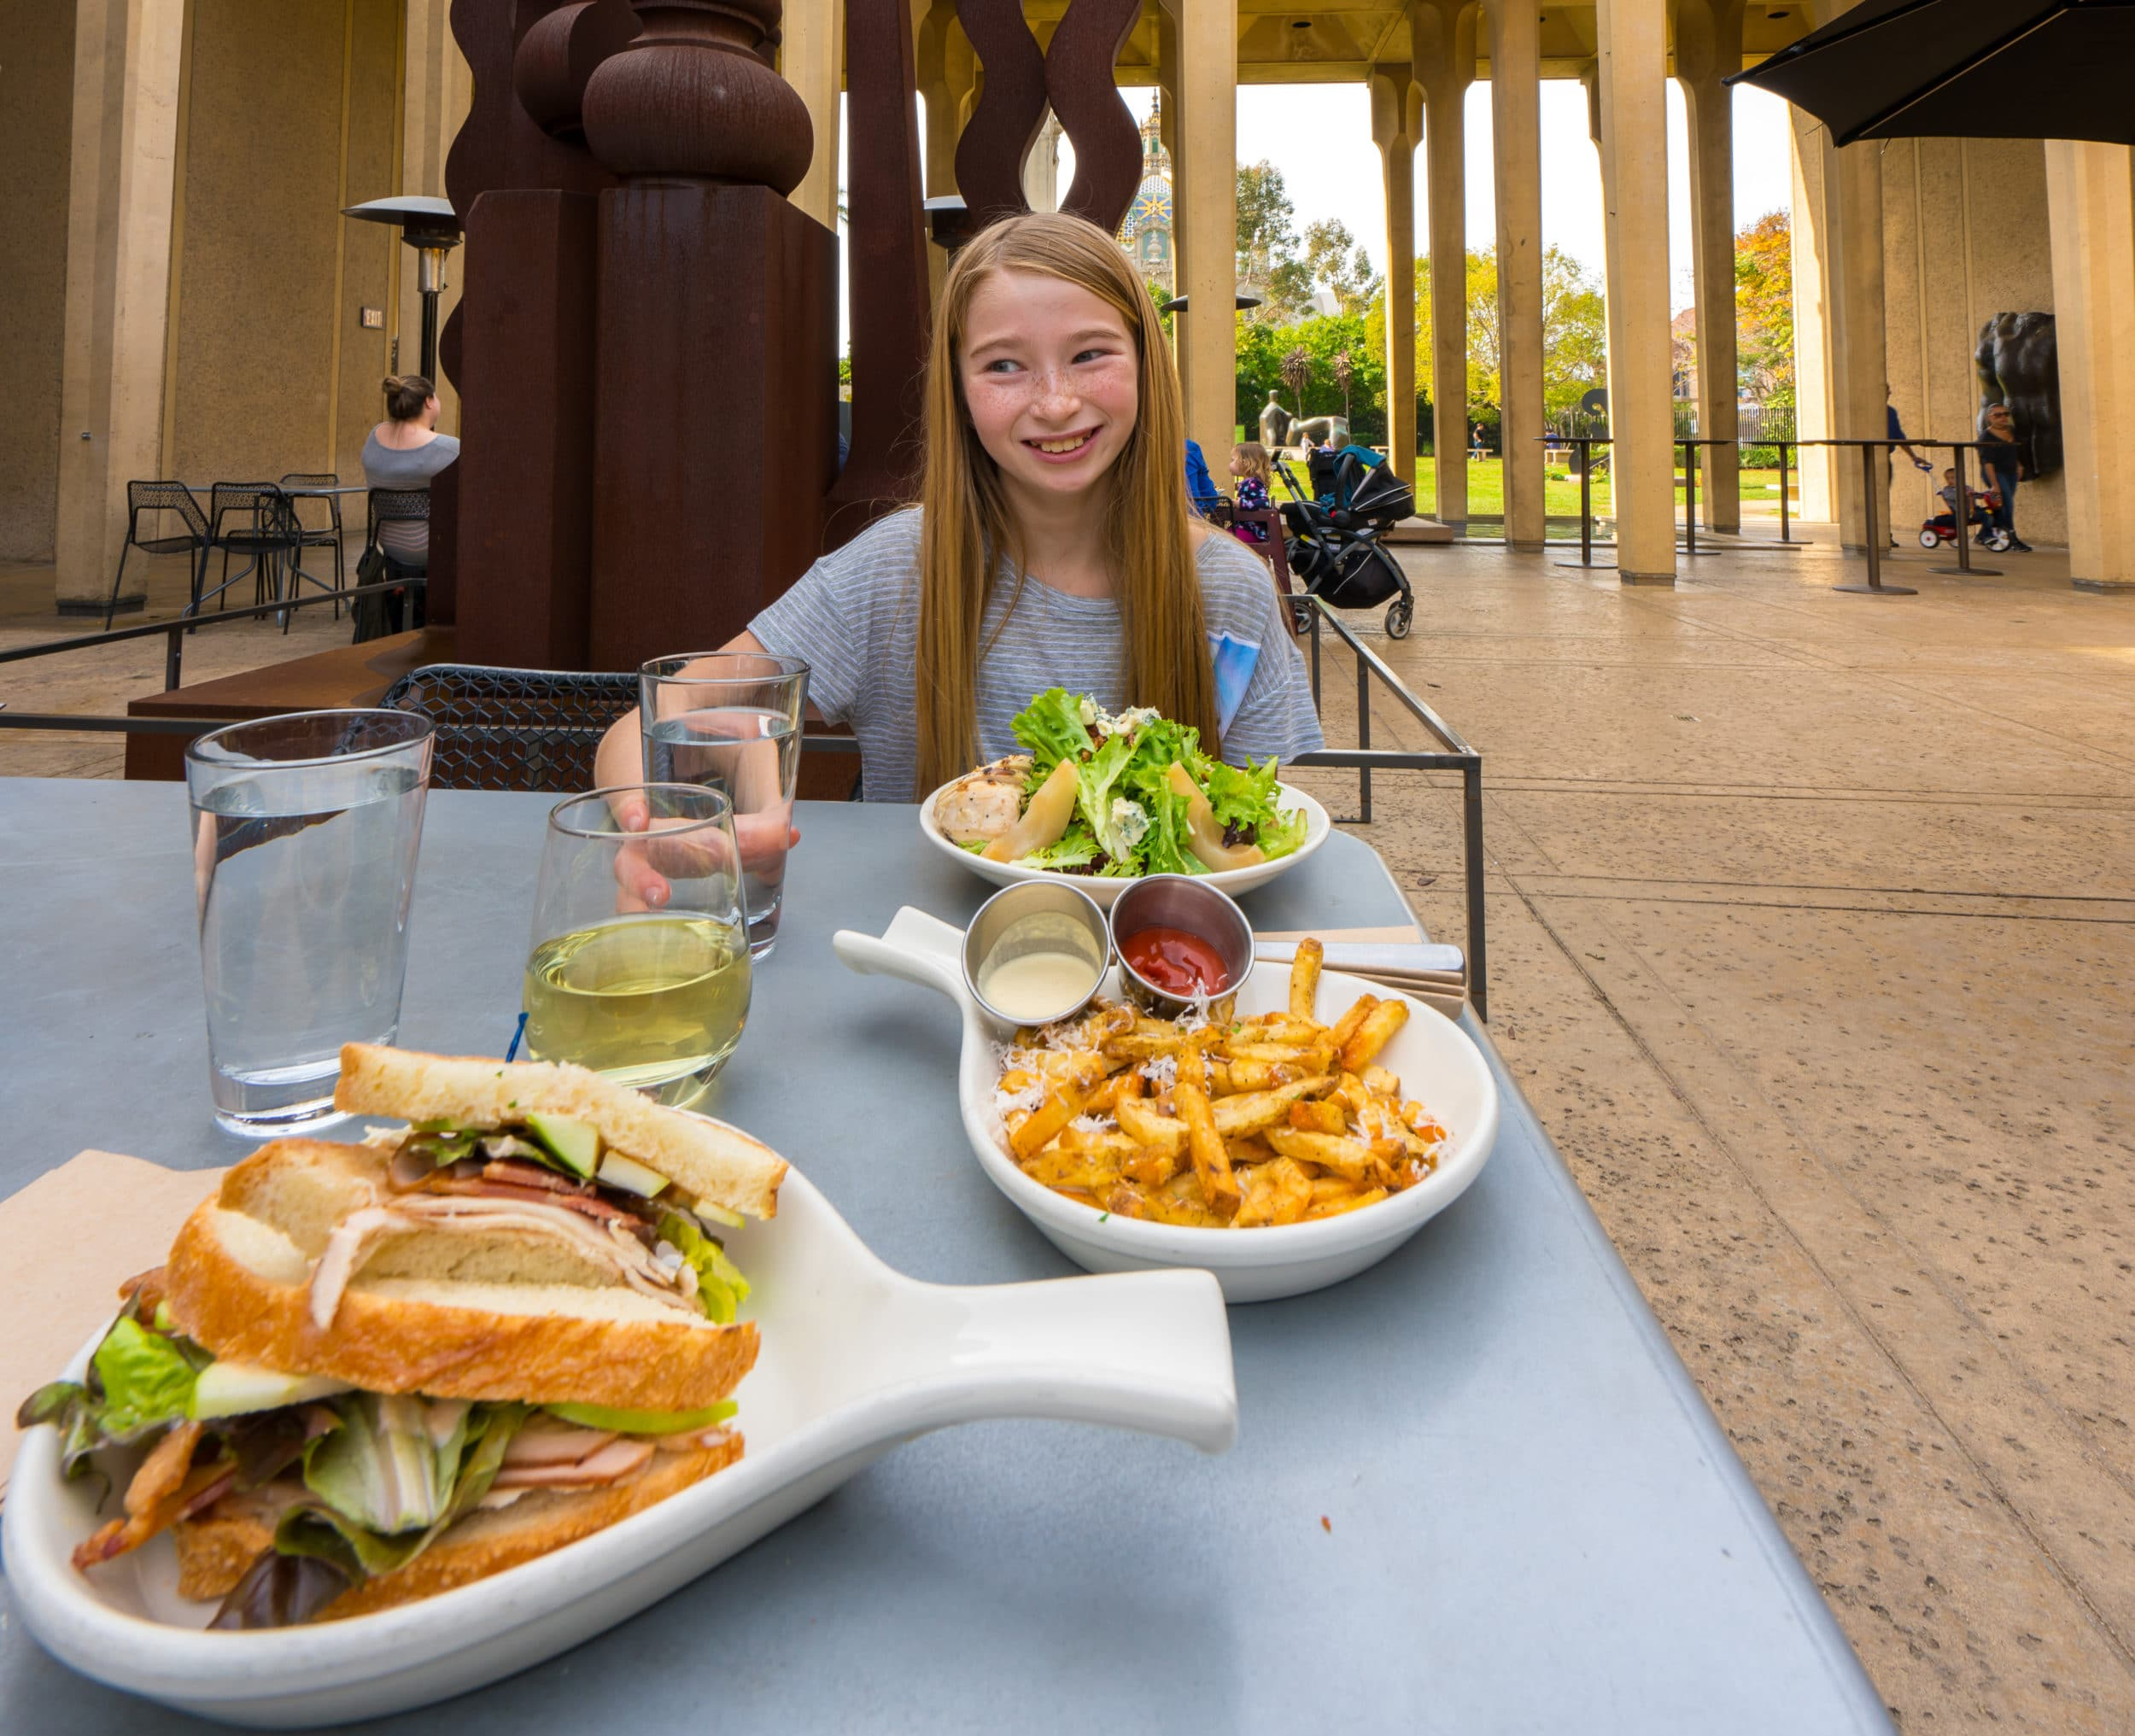 Balboa Park restaurants: Panama 66